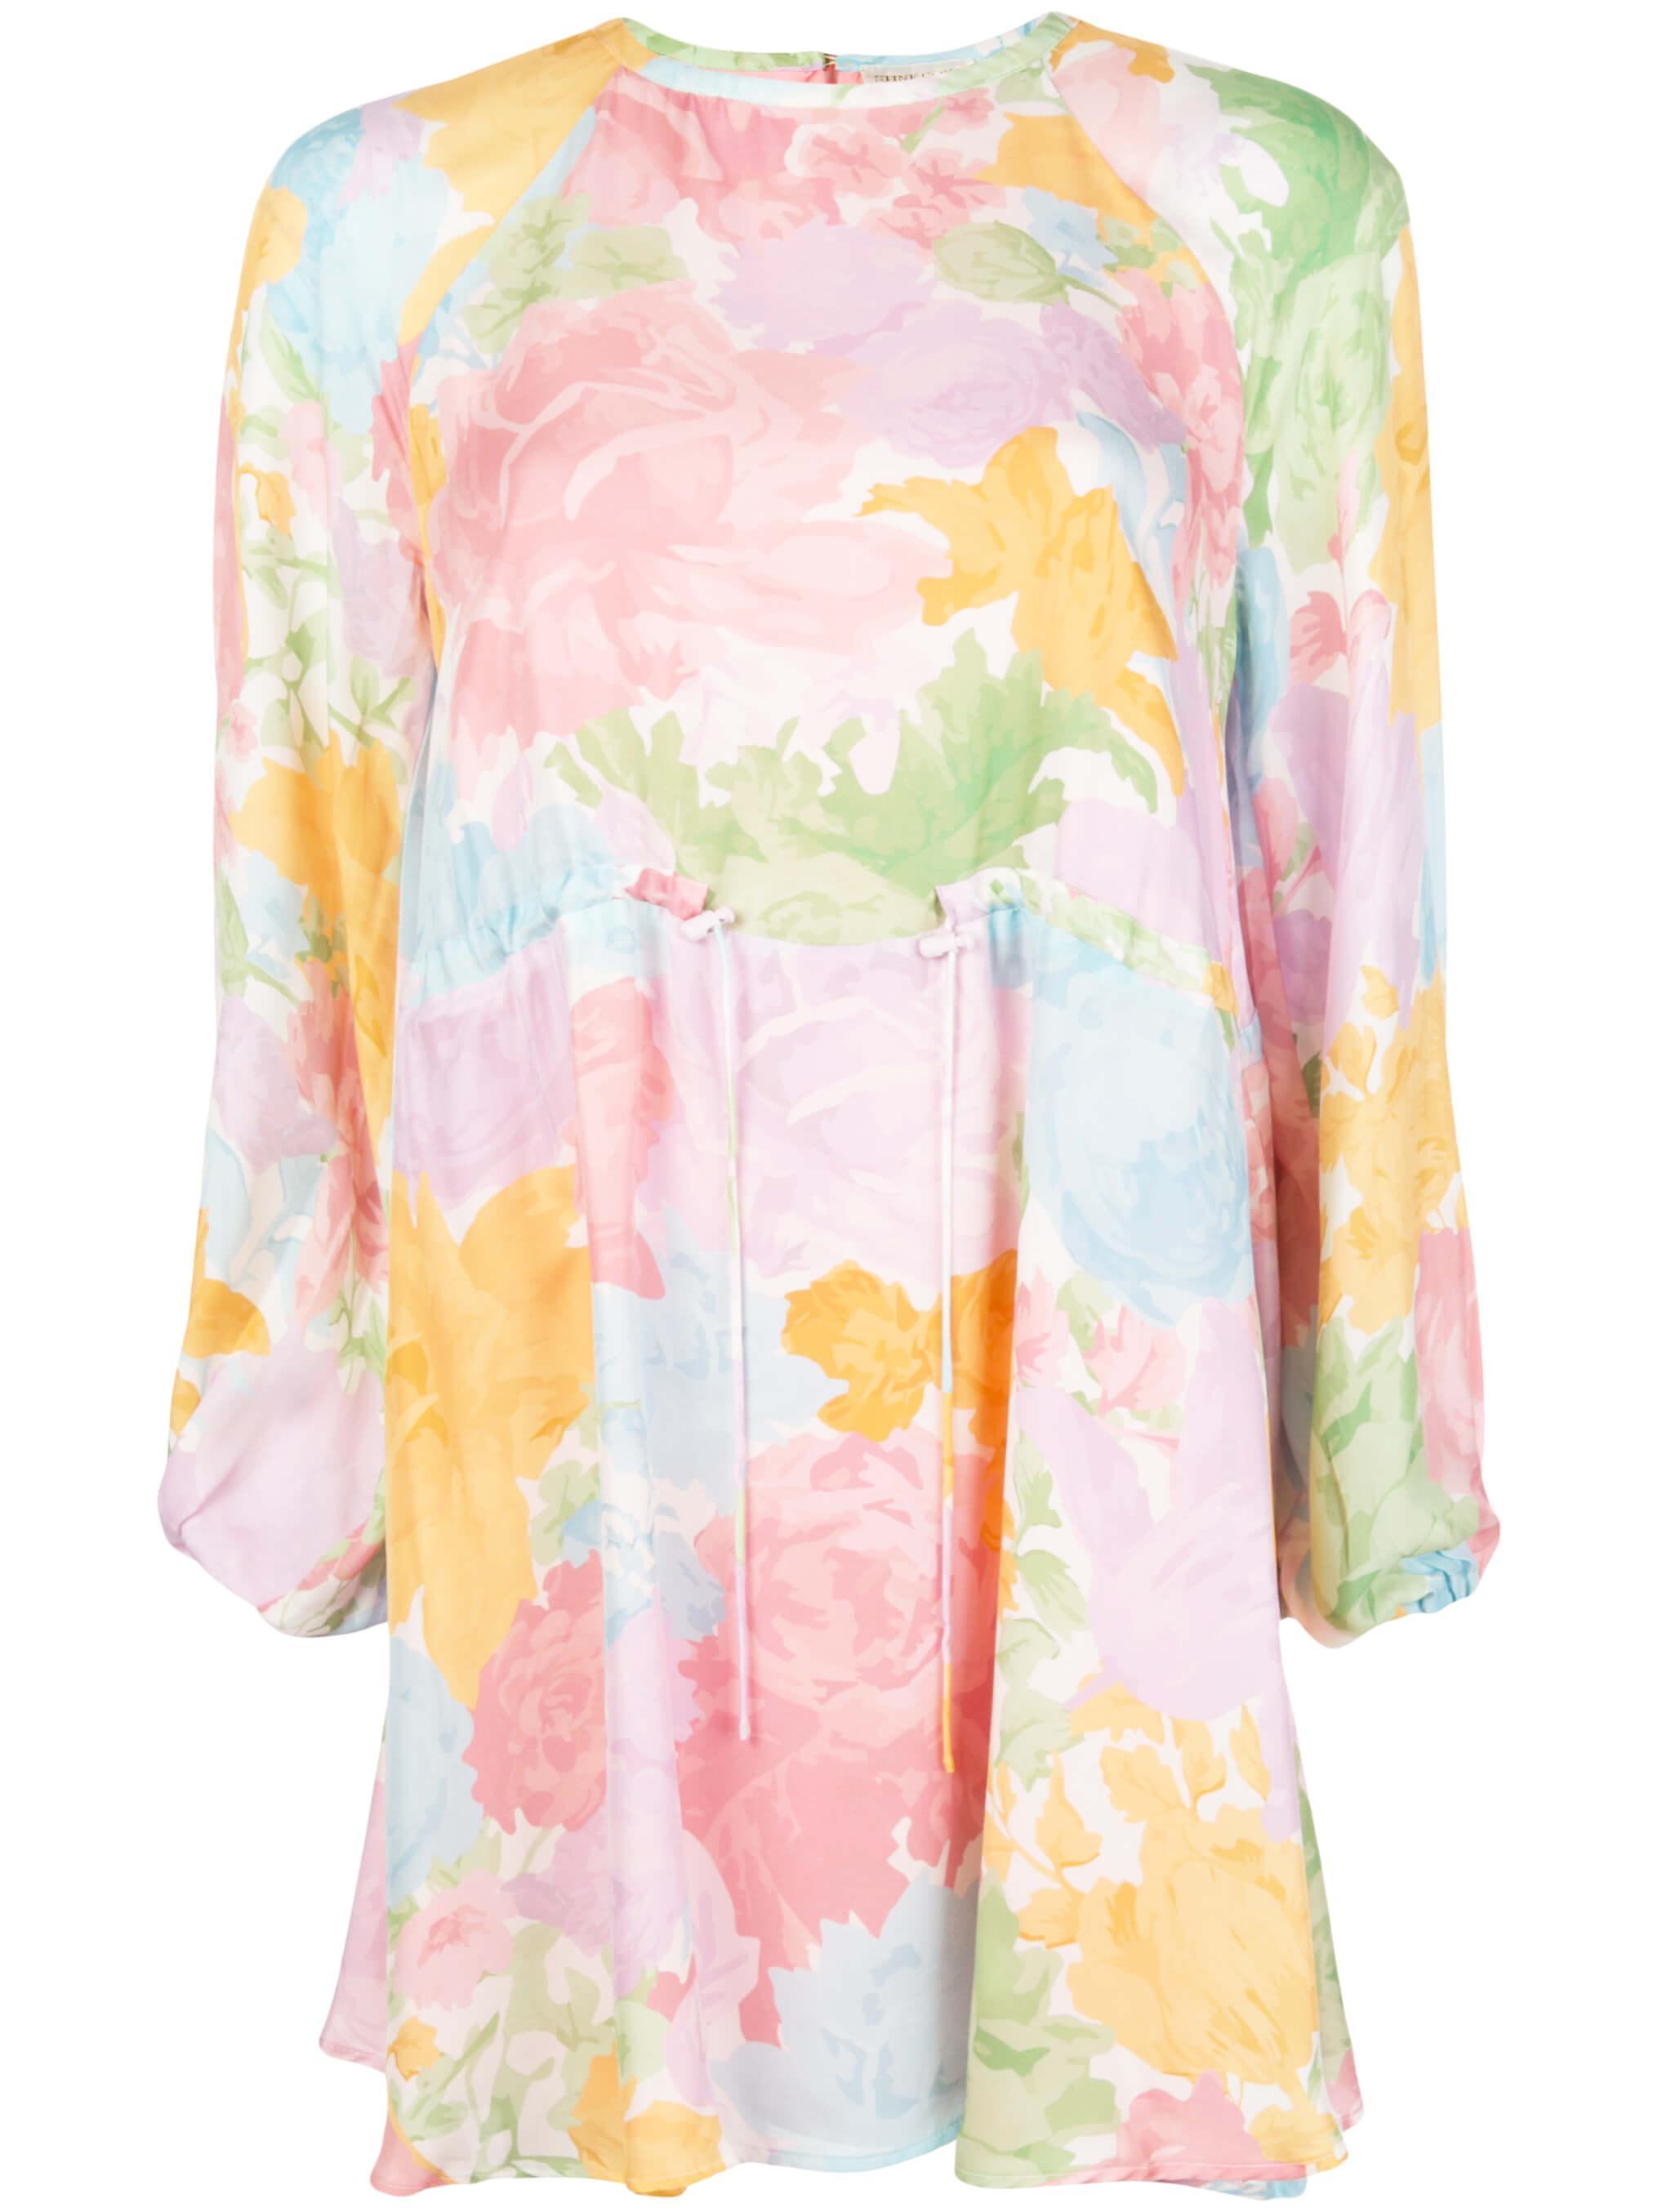 Coco Rose Garden Silk Dress Item # SG2968